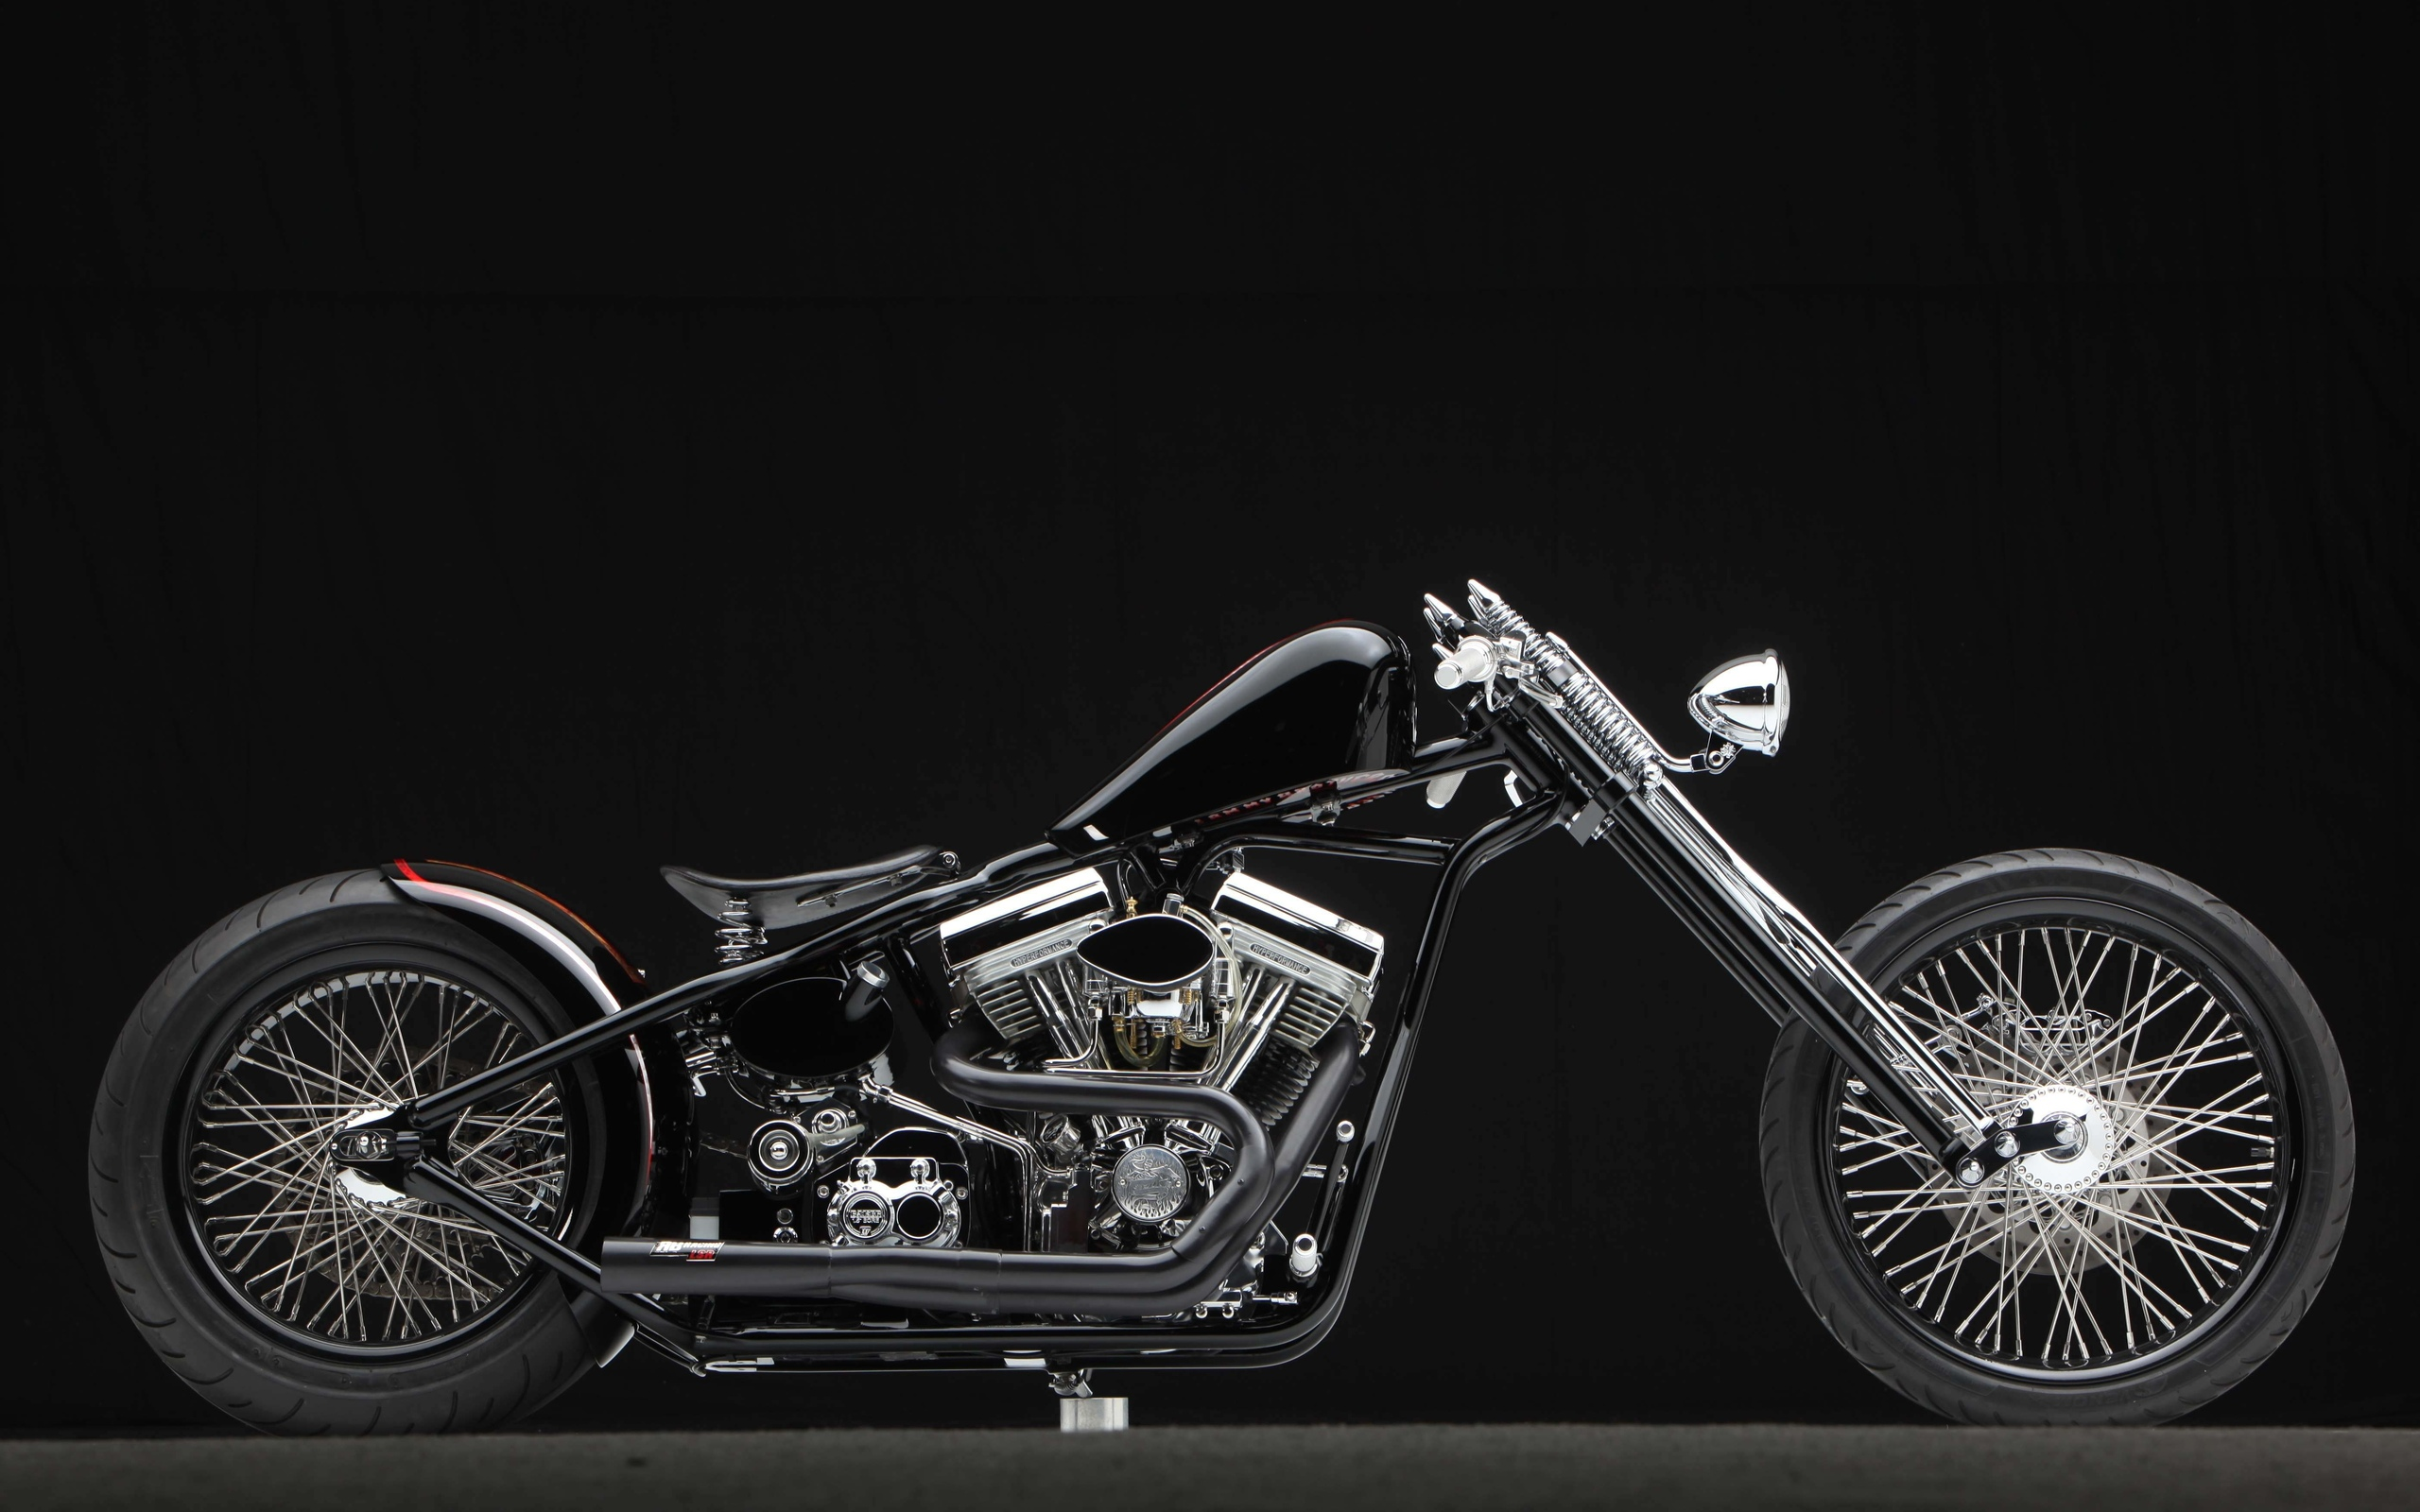 harley davidson bike hd wallpapers download